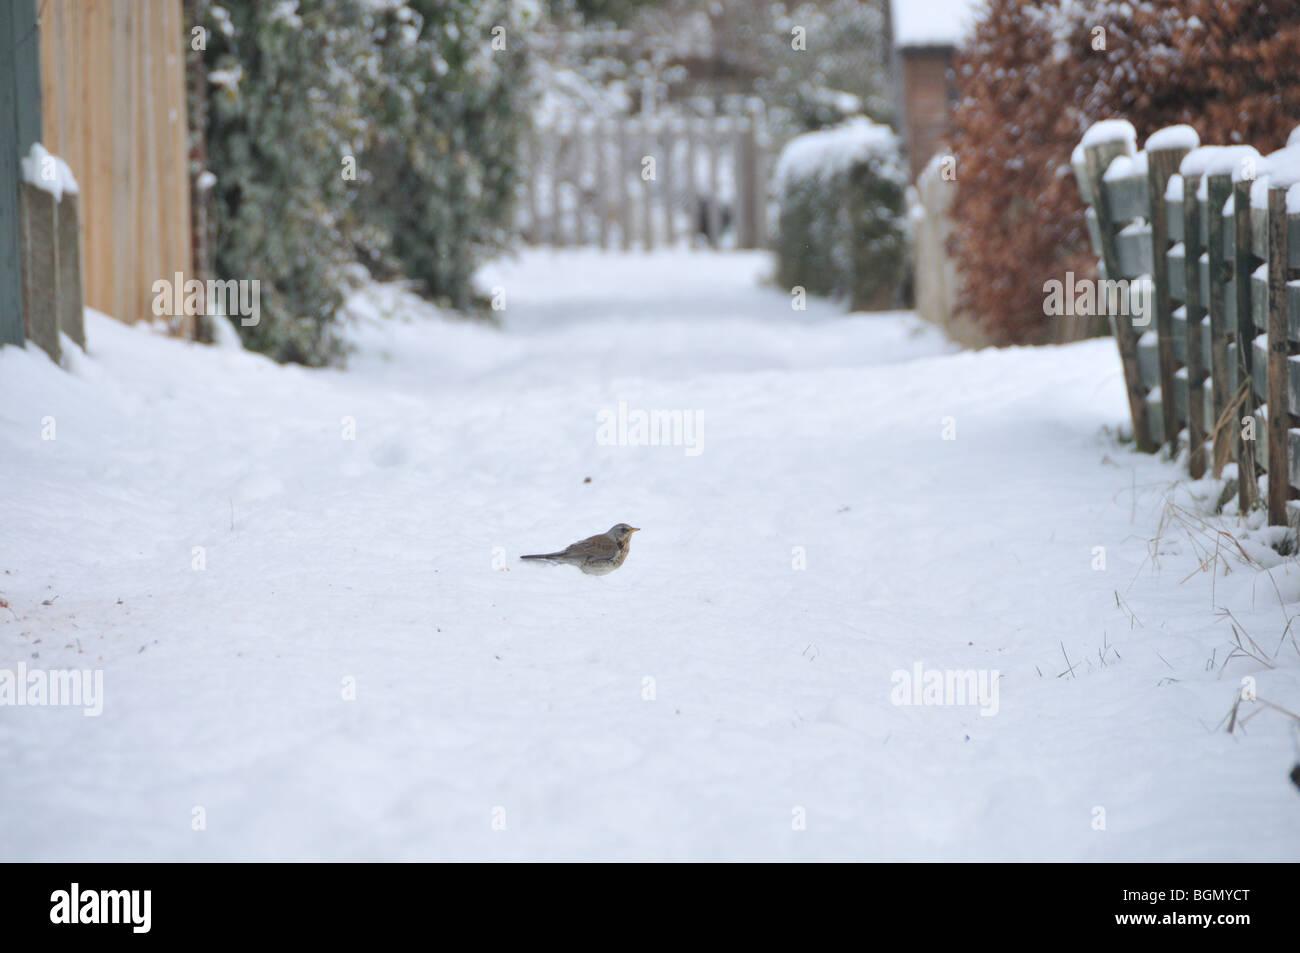 Birds in winter - Stock Image